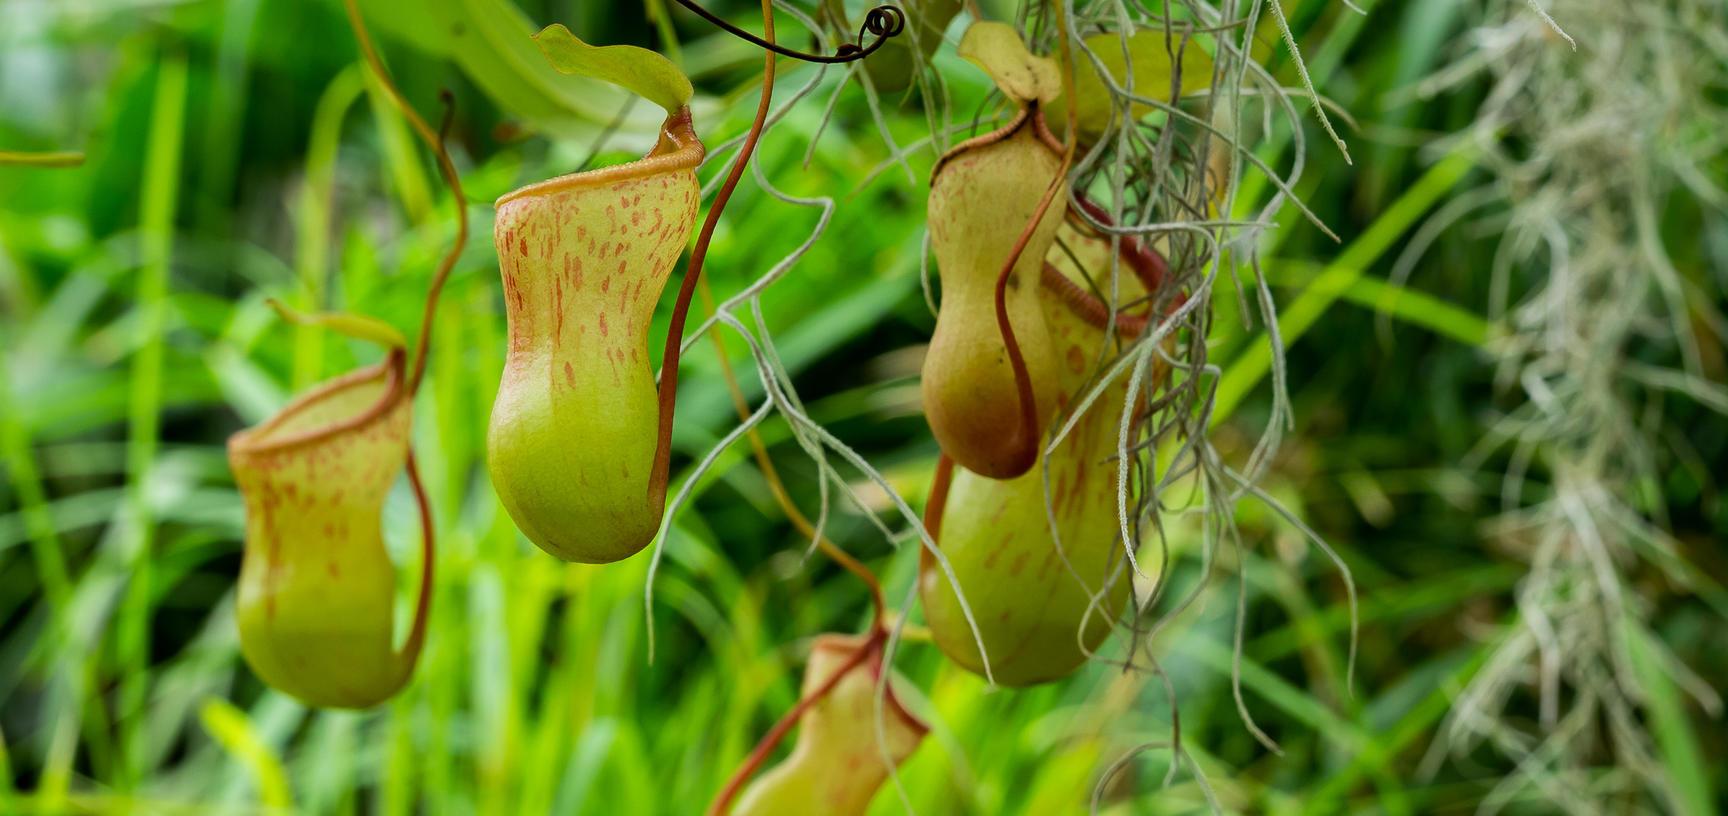 Nepenthes_p1012349.jpg